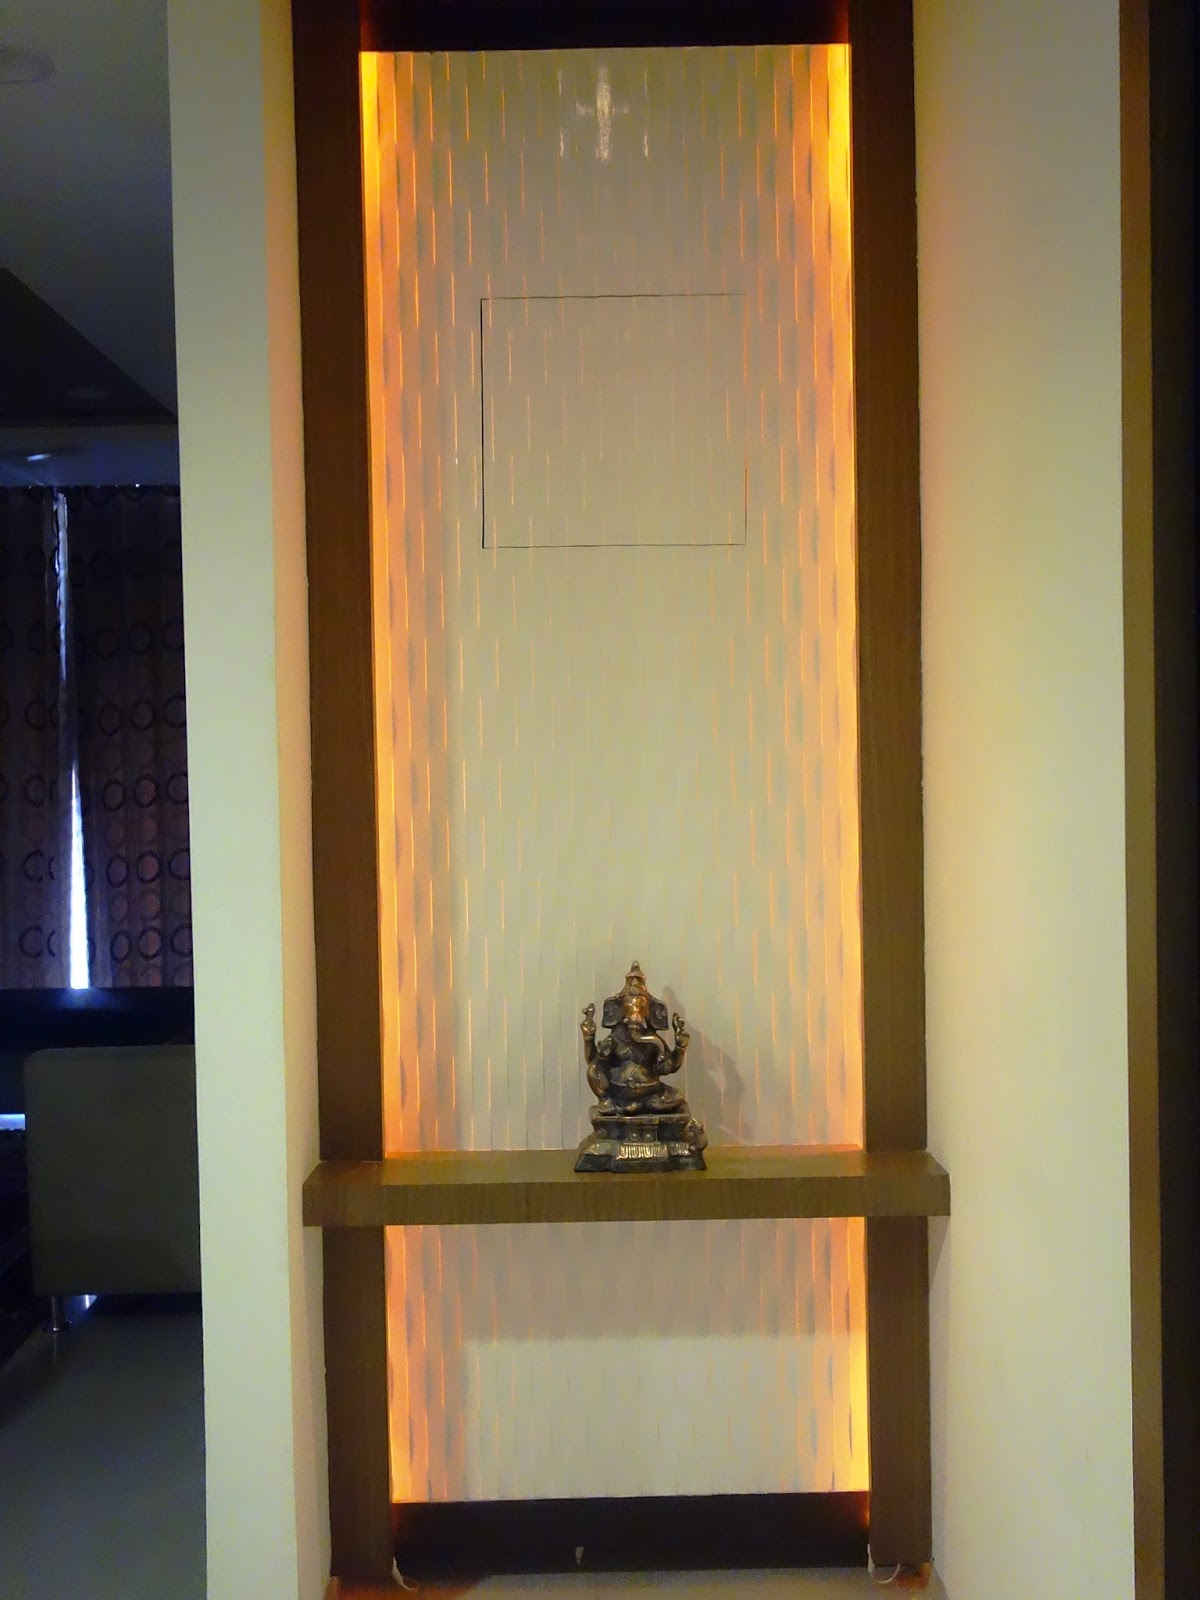 30 fantastic god room interior designs for God room interior designs